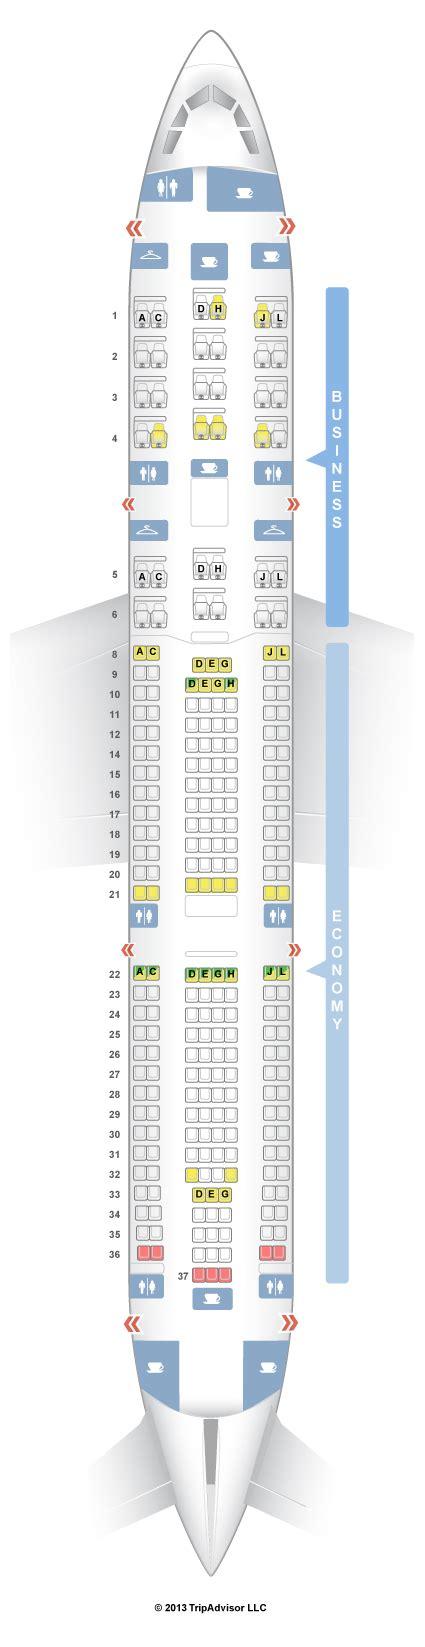 iberia airbus a340 500 seat map seatguru seat map iberia airbus a340 300 343